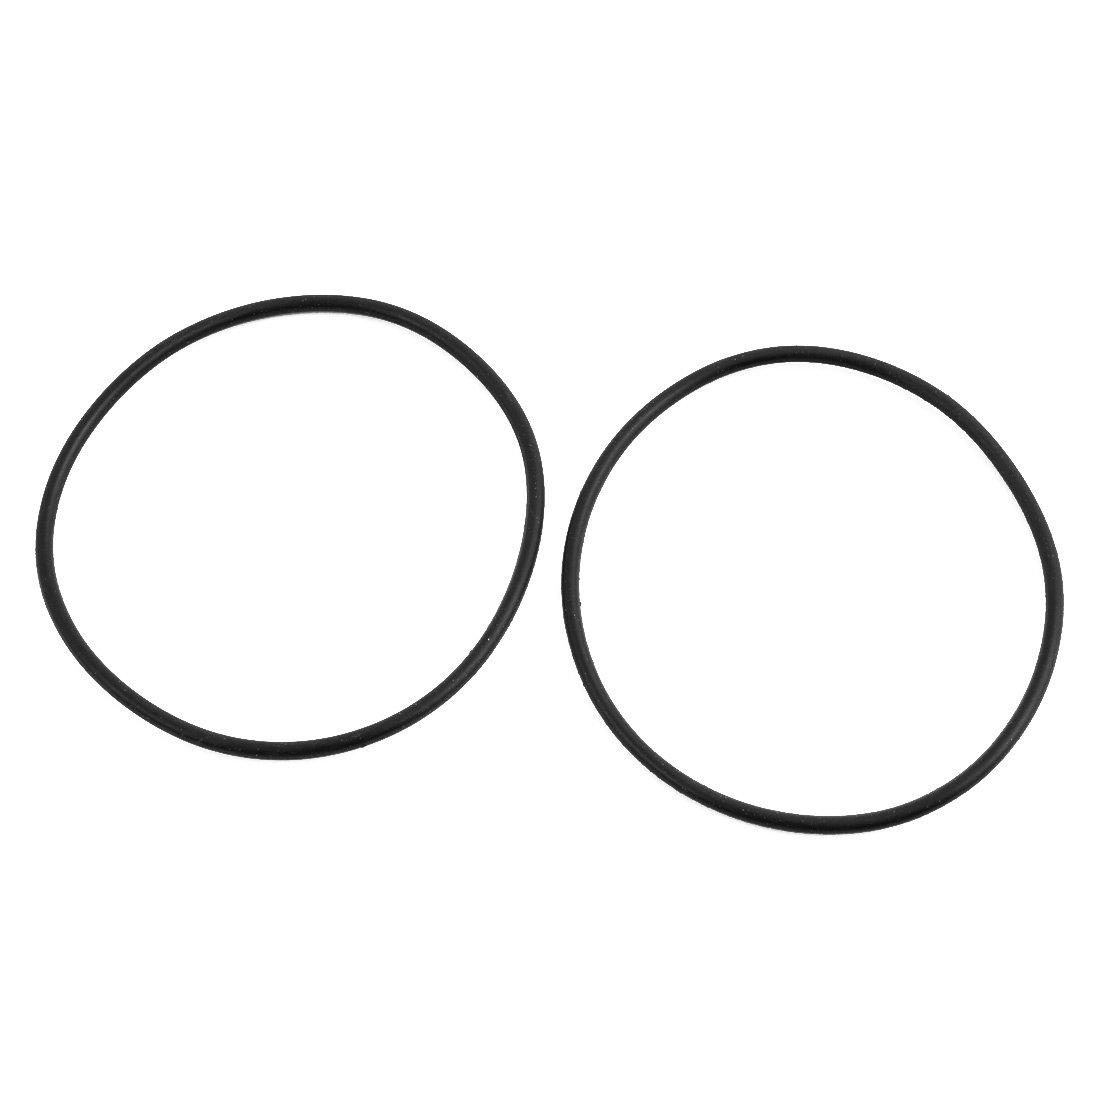 50Pcs 7mm x 1.9mm Rubber O-rings NBR Heat Resistant Sealing Ring Grommets Black